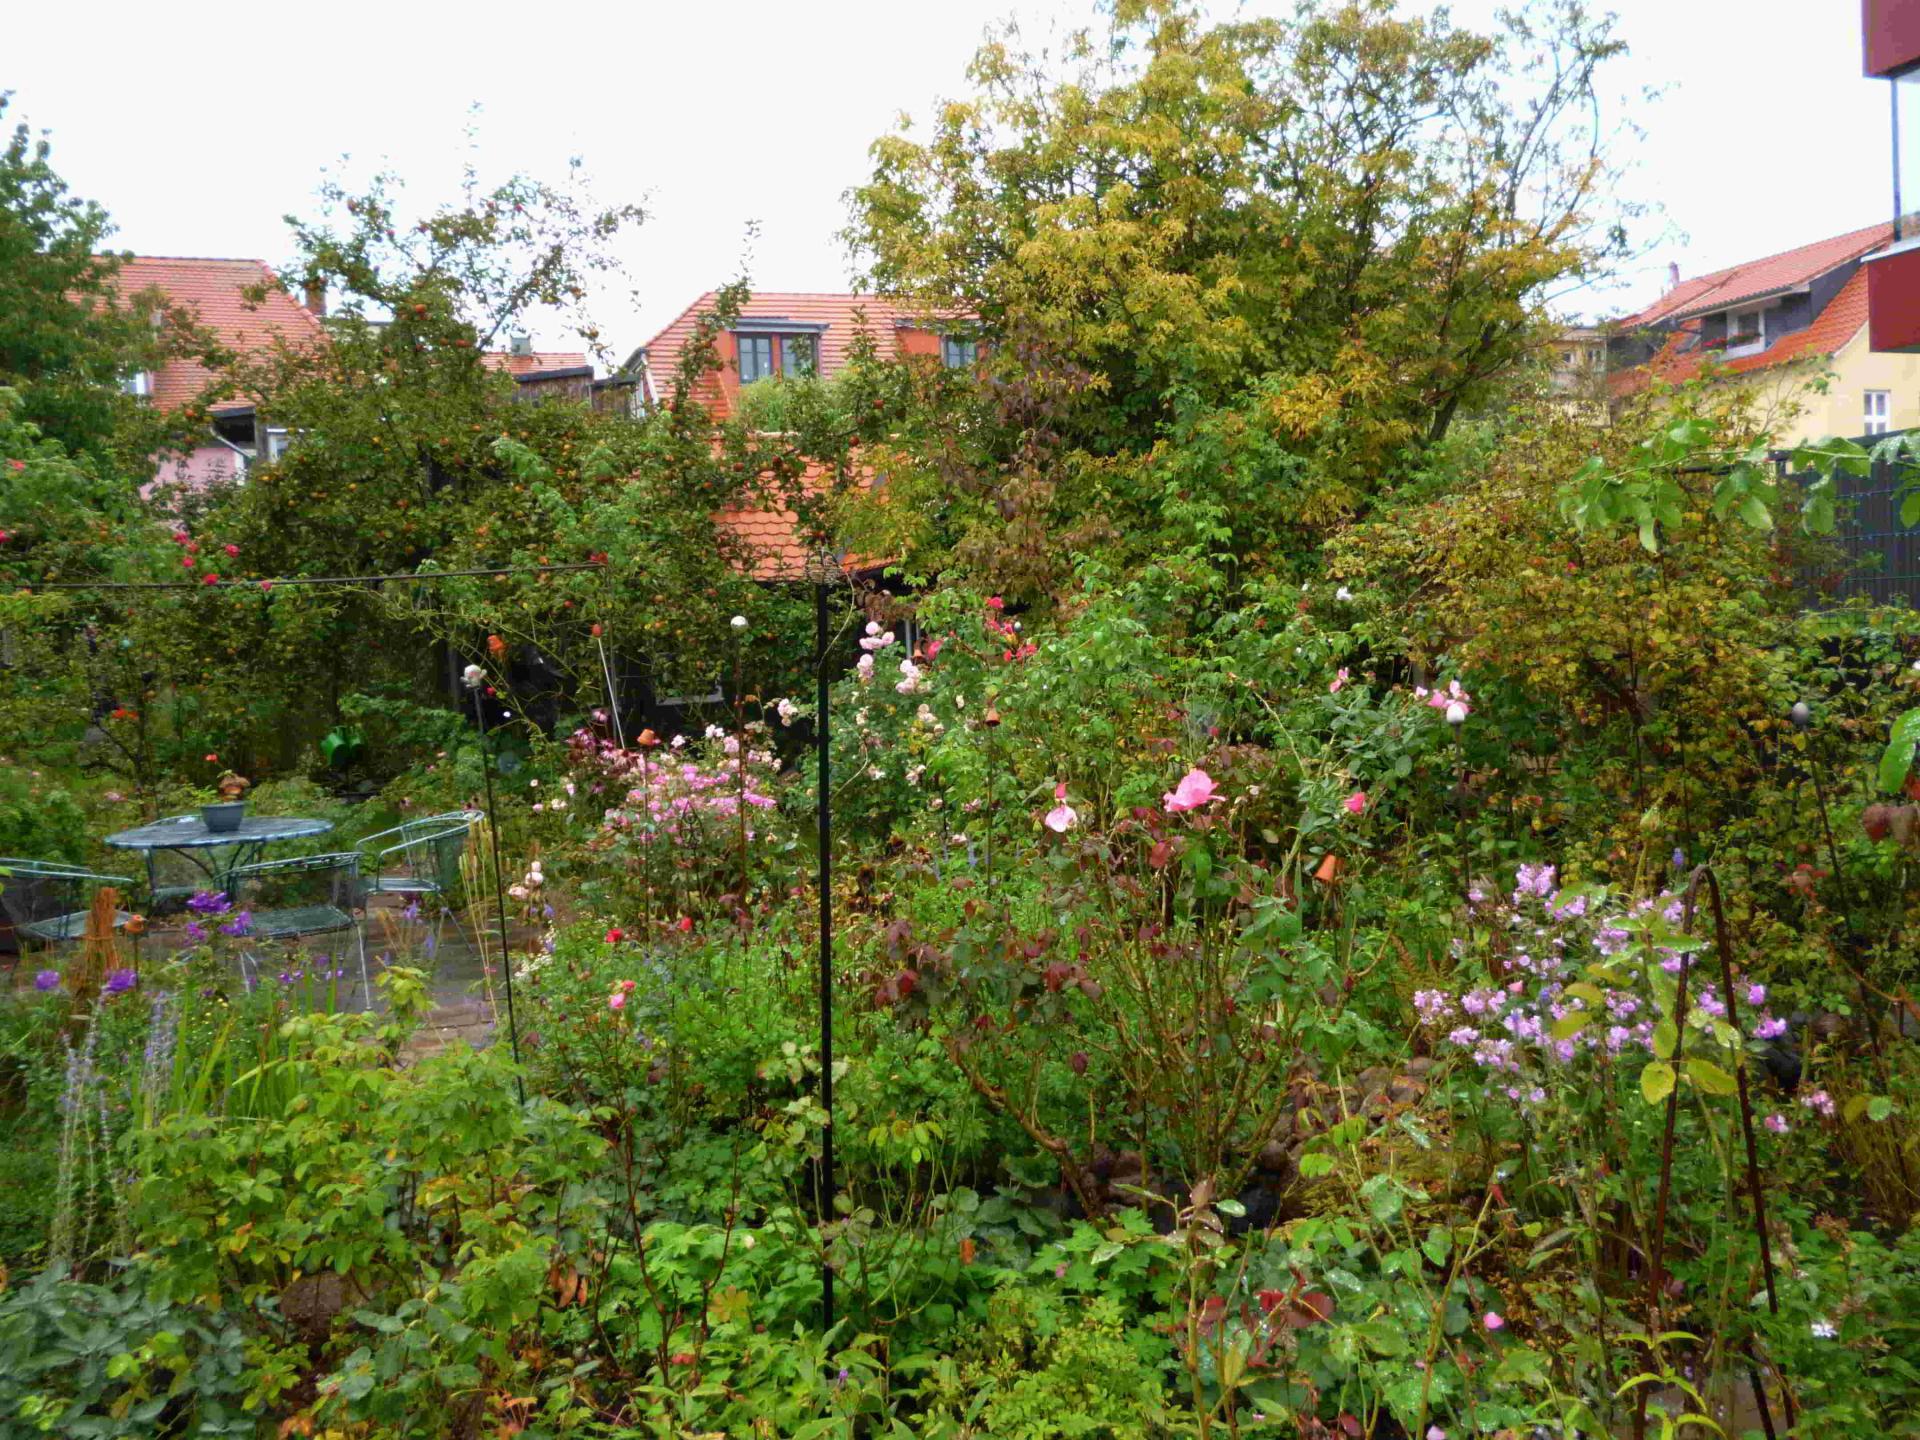 Offene Gartenpfporte 26-09-2020 Bild 14